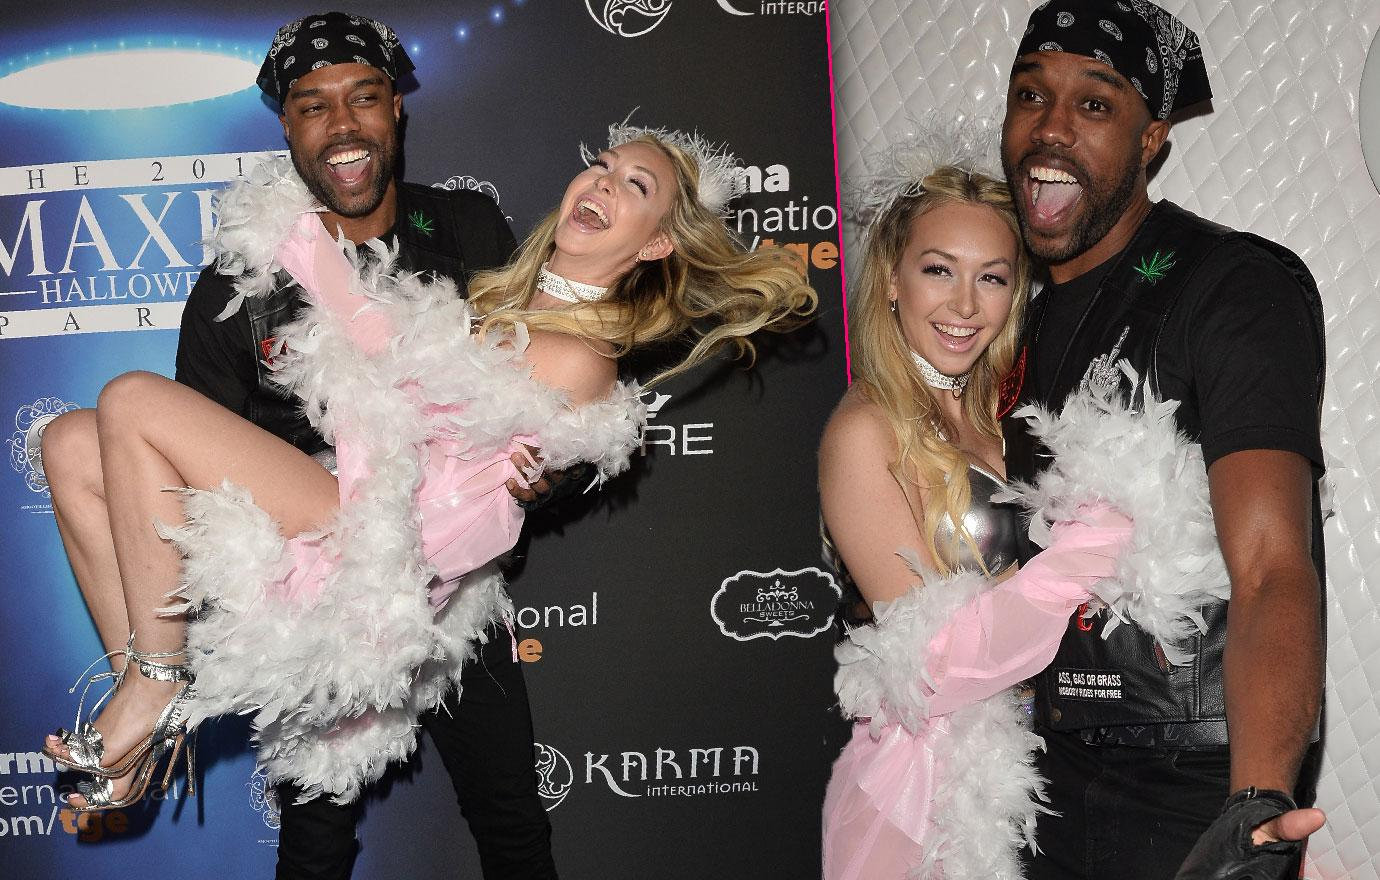 DeMario Jackson Picks Up Corinne Olympios Halloween Party Bikini